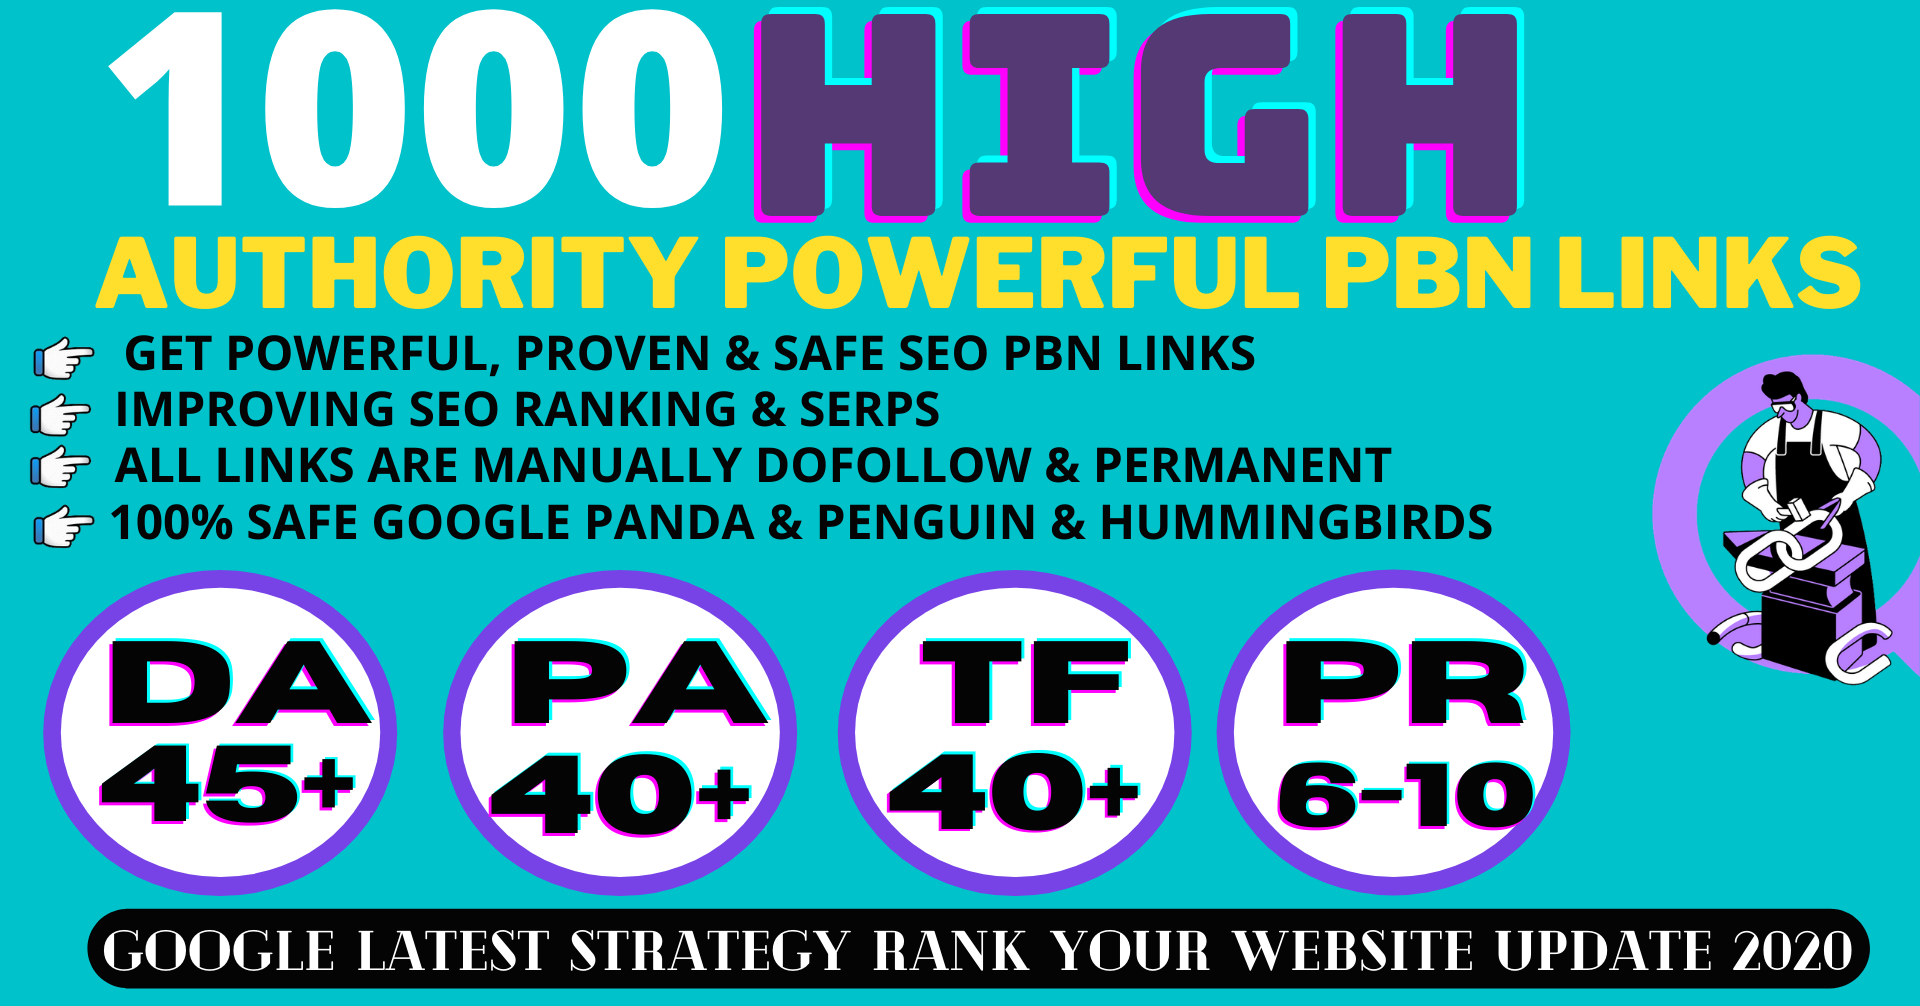 1000+ Permanent PBN Backlinks Web2.0 With High DA45+PA40+PR6+ DR 50+ Links Homepage Unique website